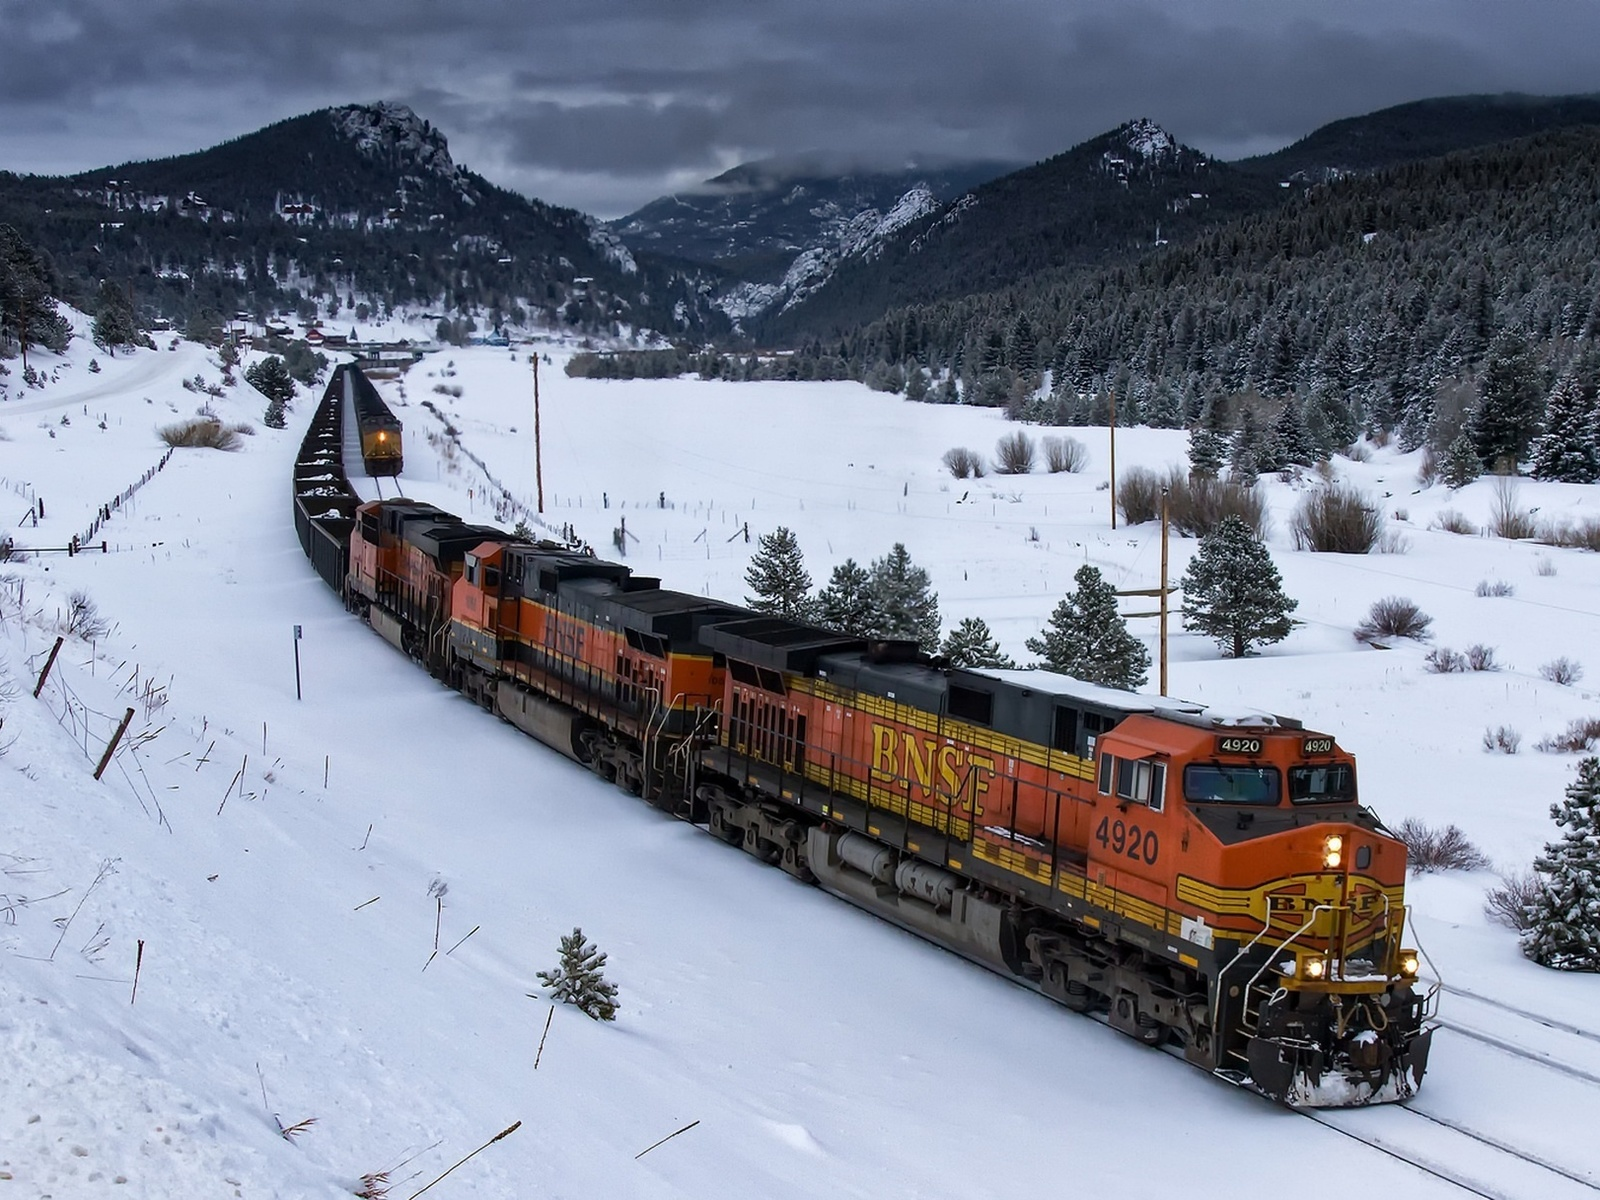 поезд, вагоны, зима